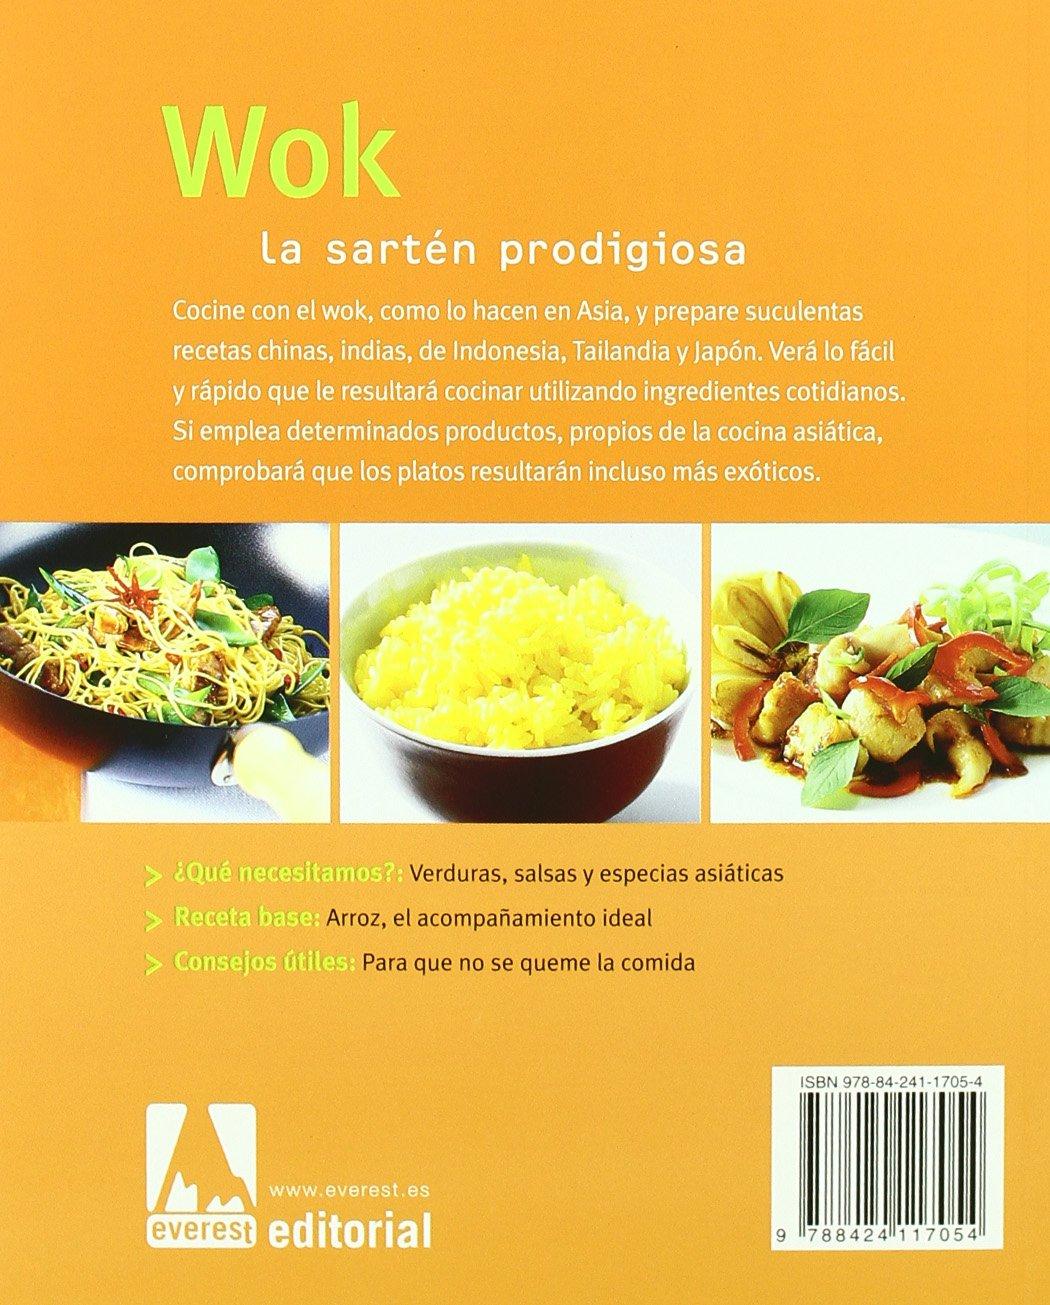 Wok: La Sarten Prodigiosa (Spanish Edition): Reinhardt Hess: 9788424117054: Amazon.com: Books